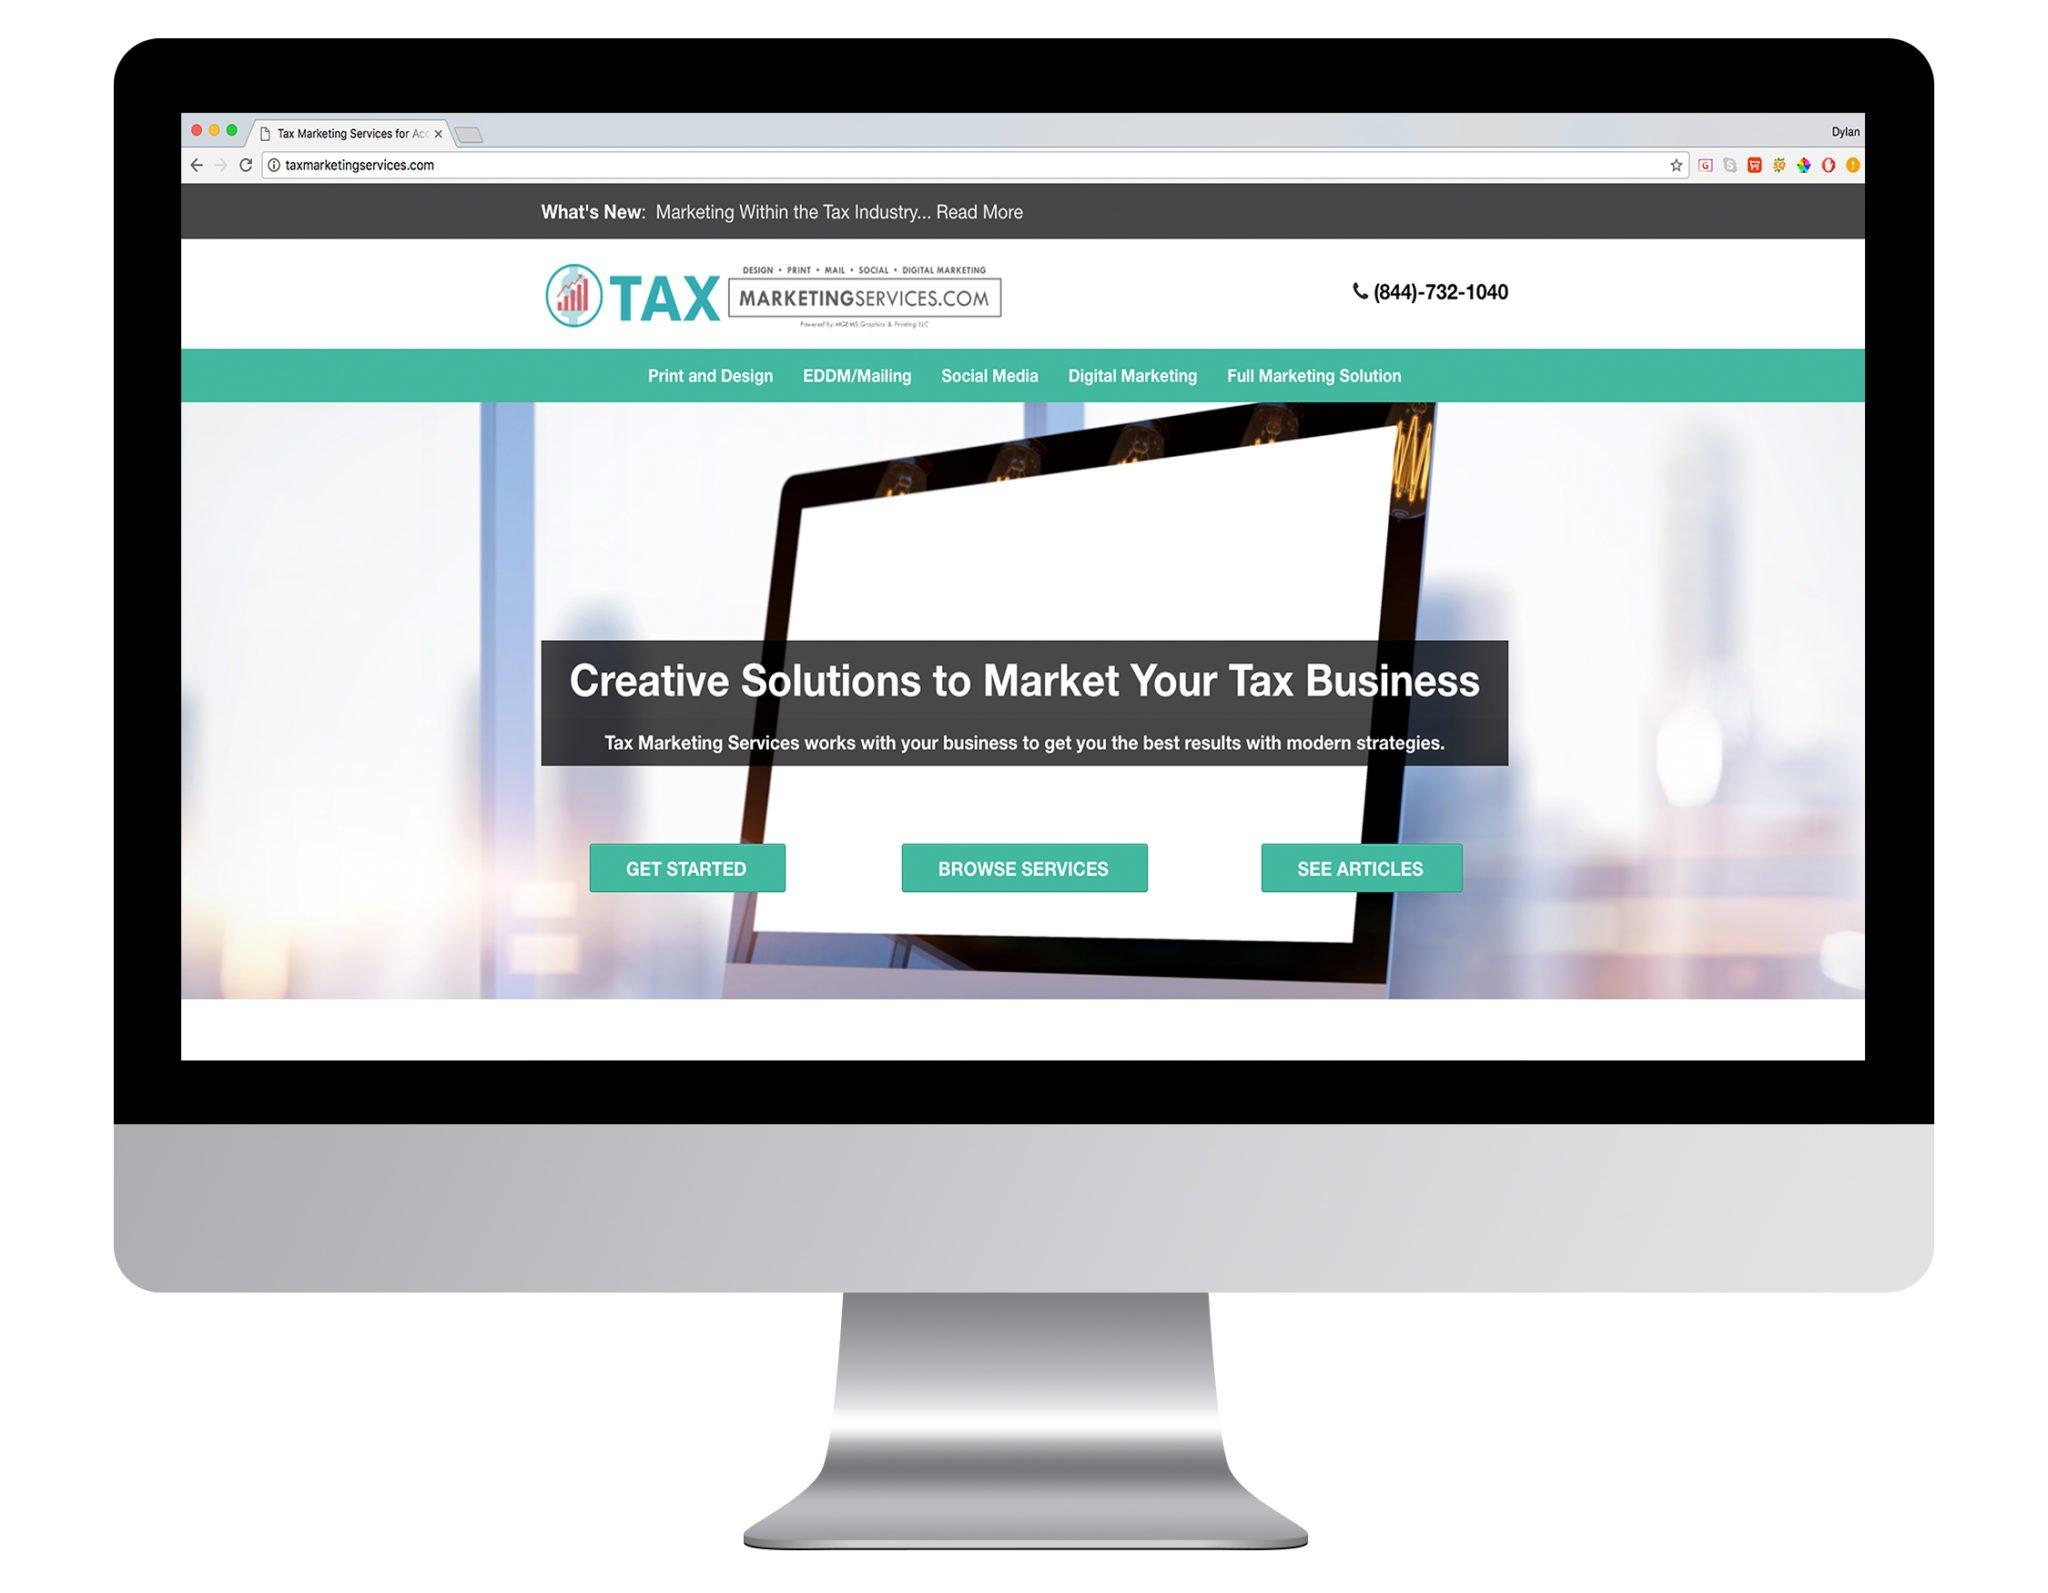 Web Design Portfolio Sample - Tax Marketing Services